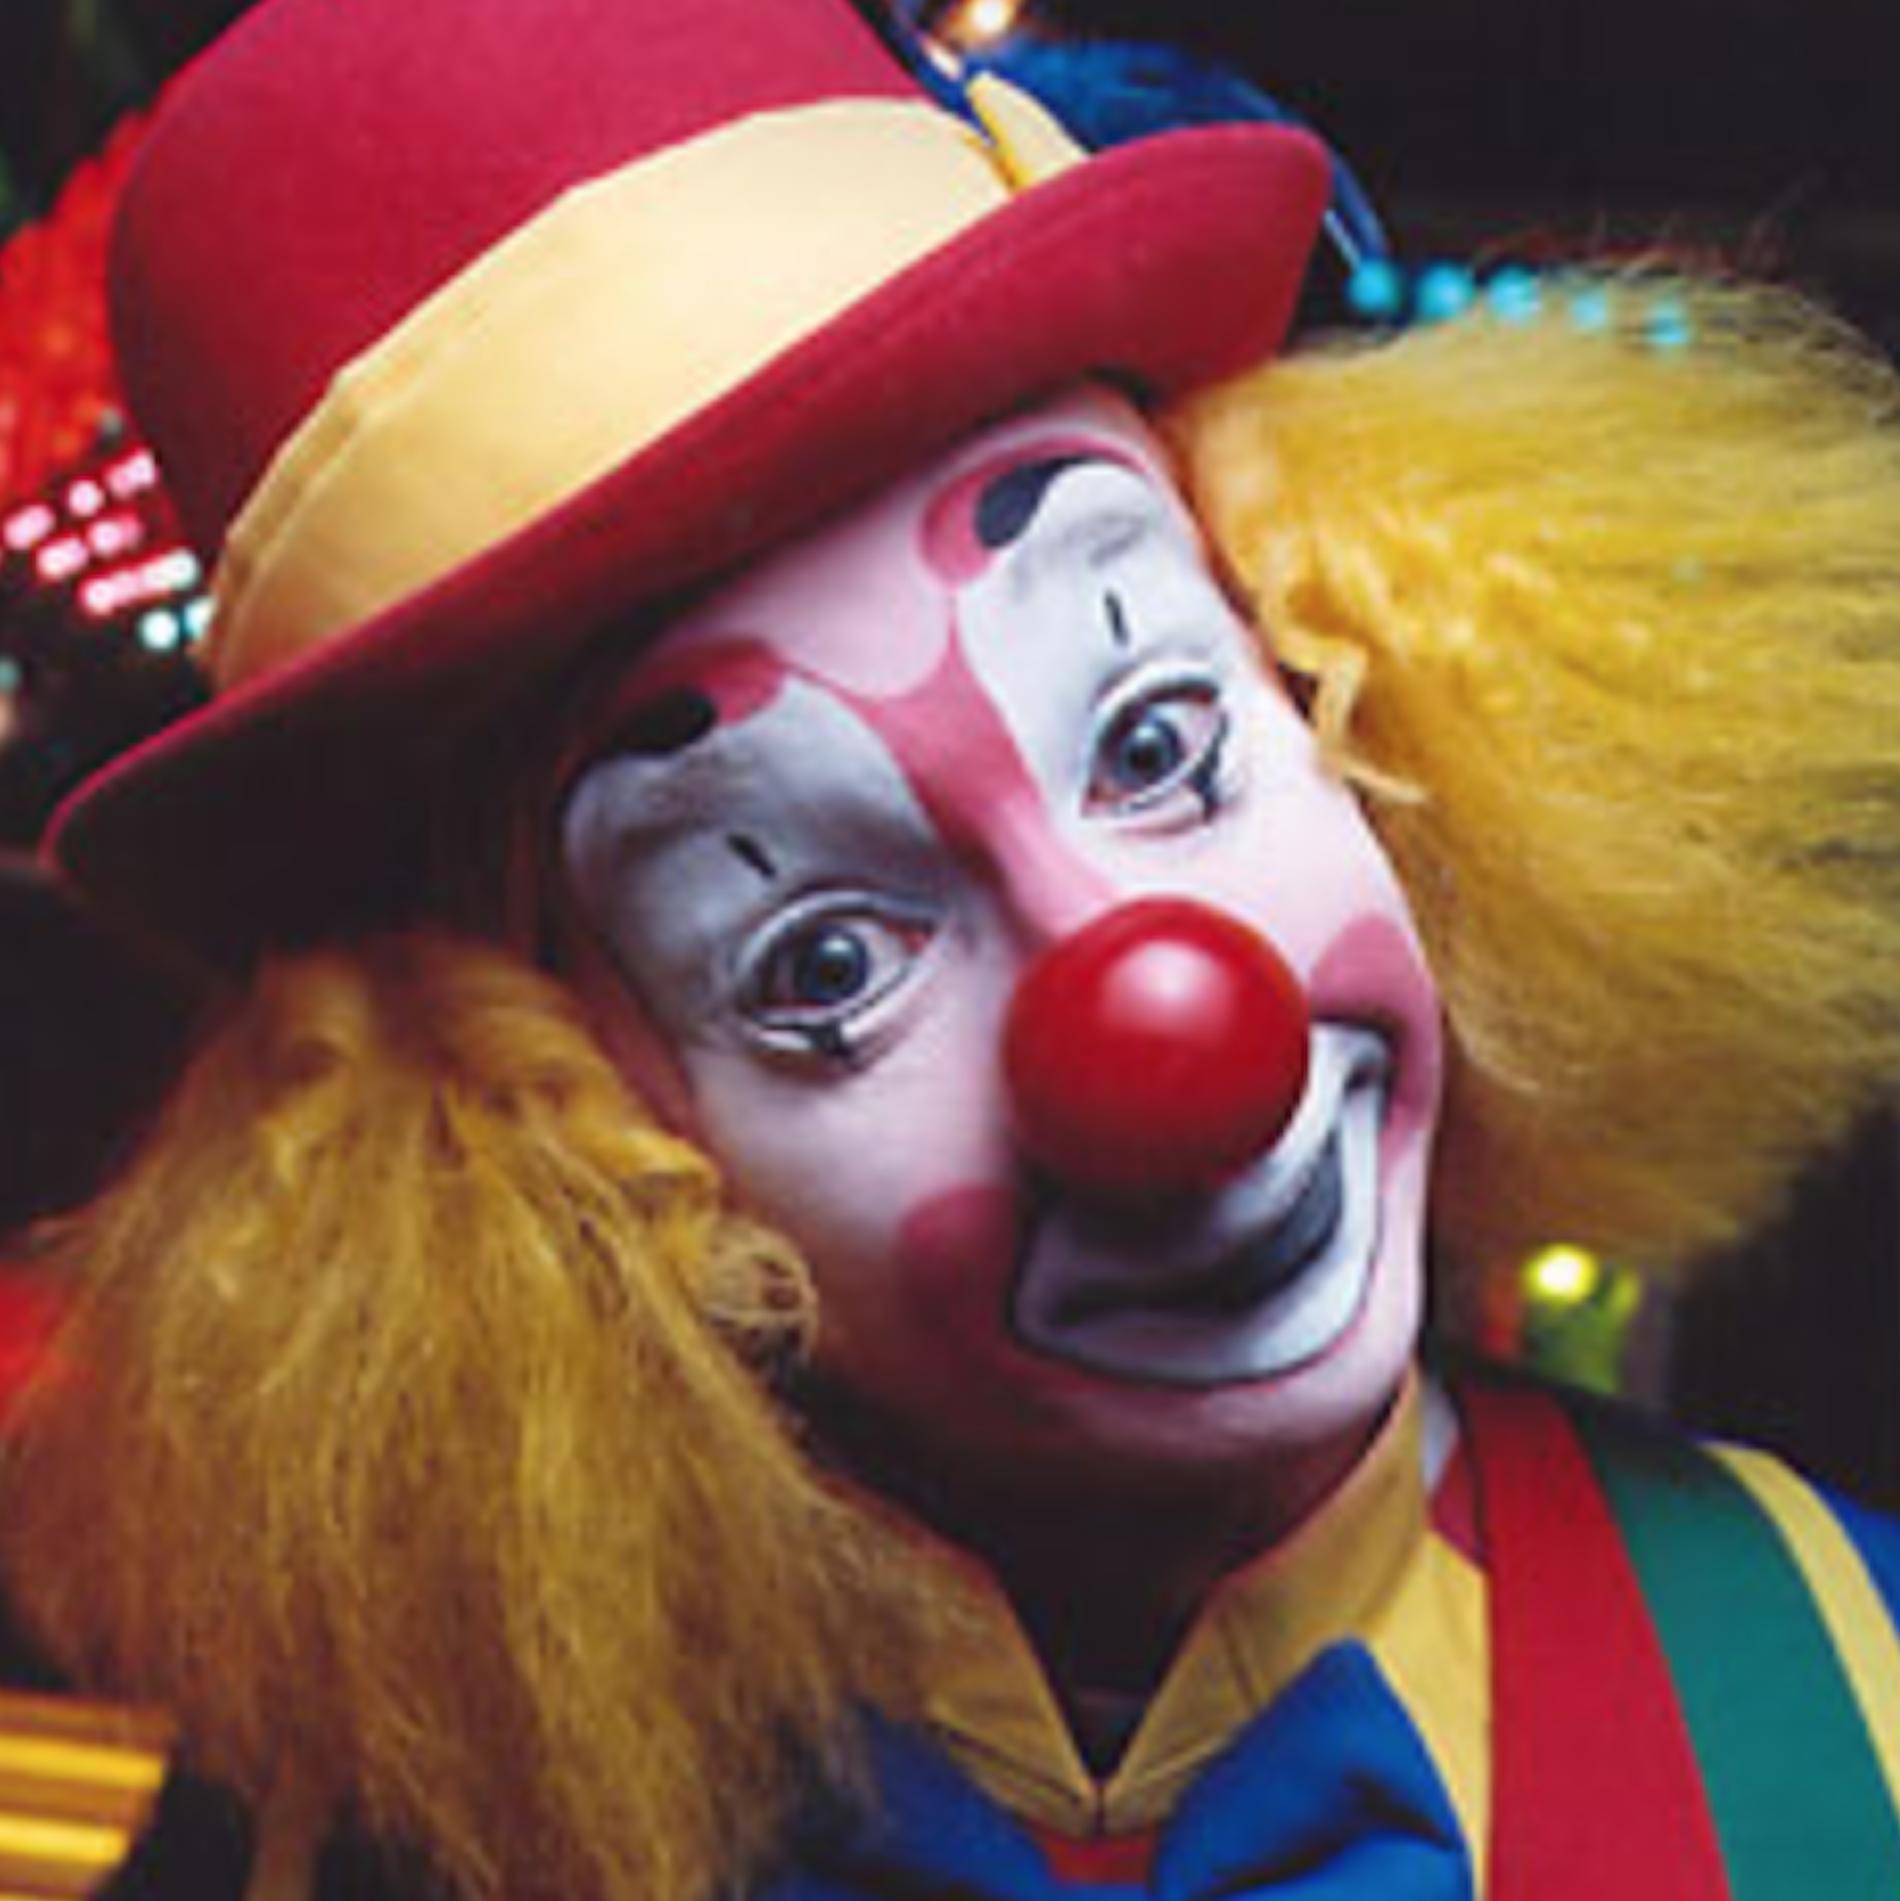 Lanky the Clown